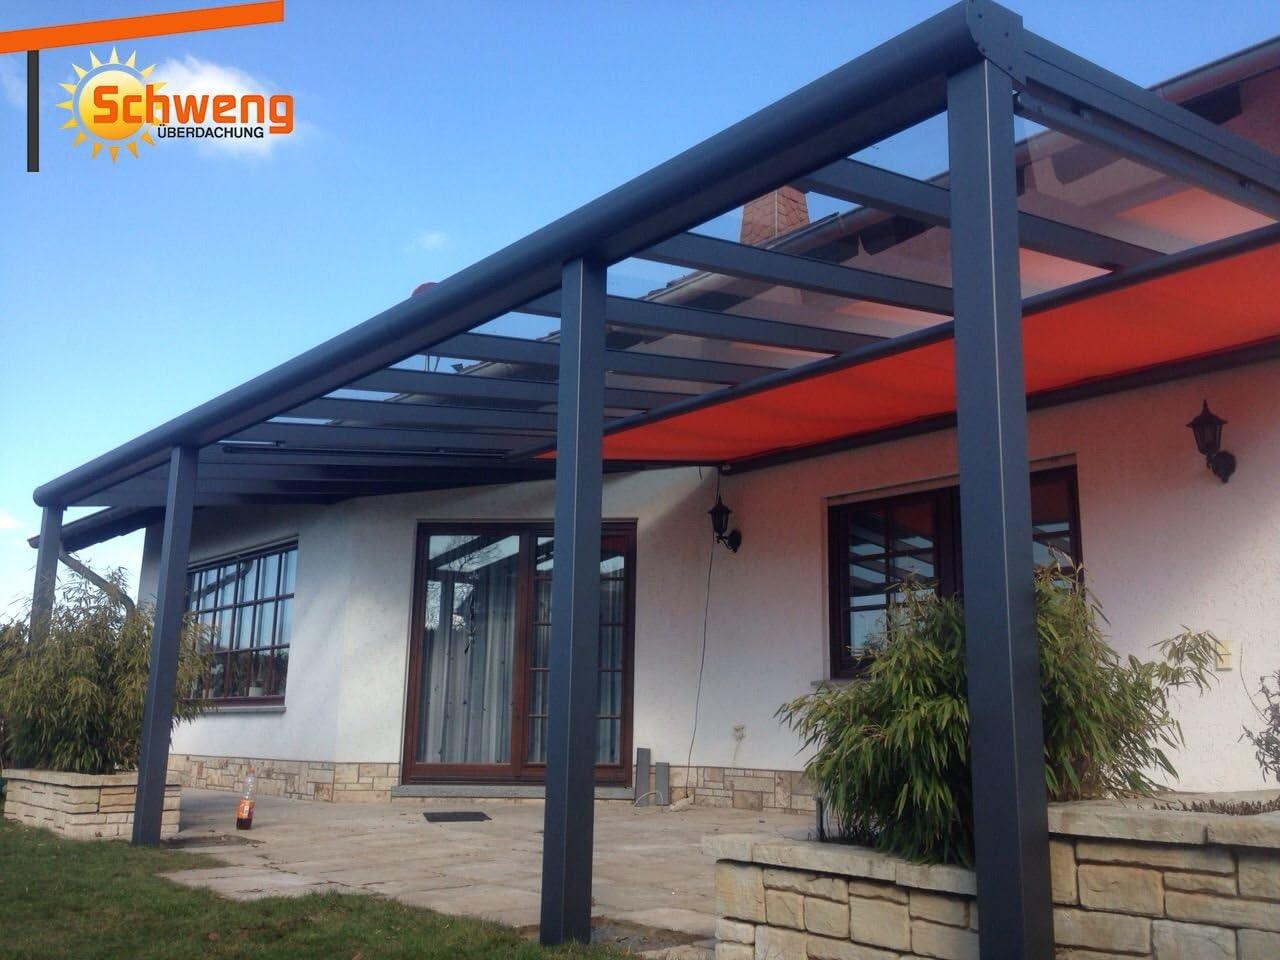 Alta calidad prikker-überdachungen schweng aluminio 16 PLACAS DE policarbonato mm B: 6,00 m x 4,50 m T: Amazon.es: Jardín